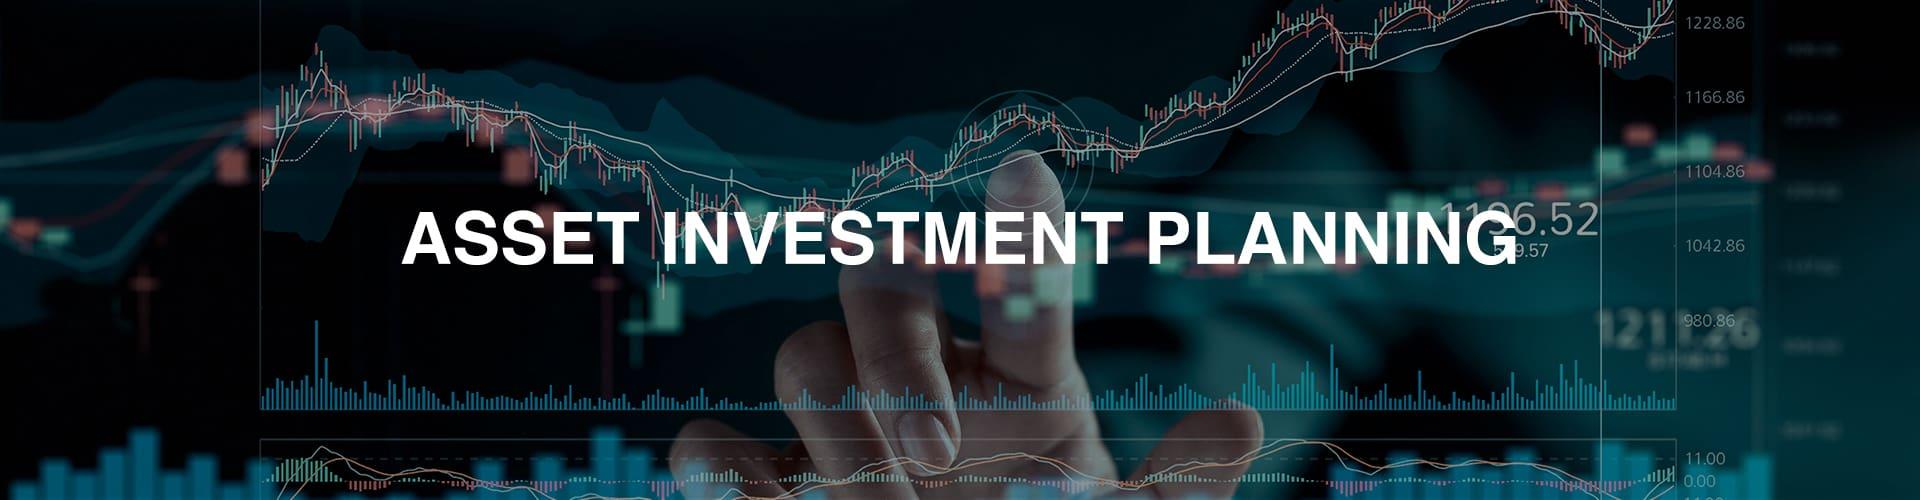 Asset Investment Planning